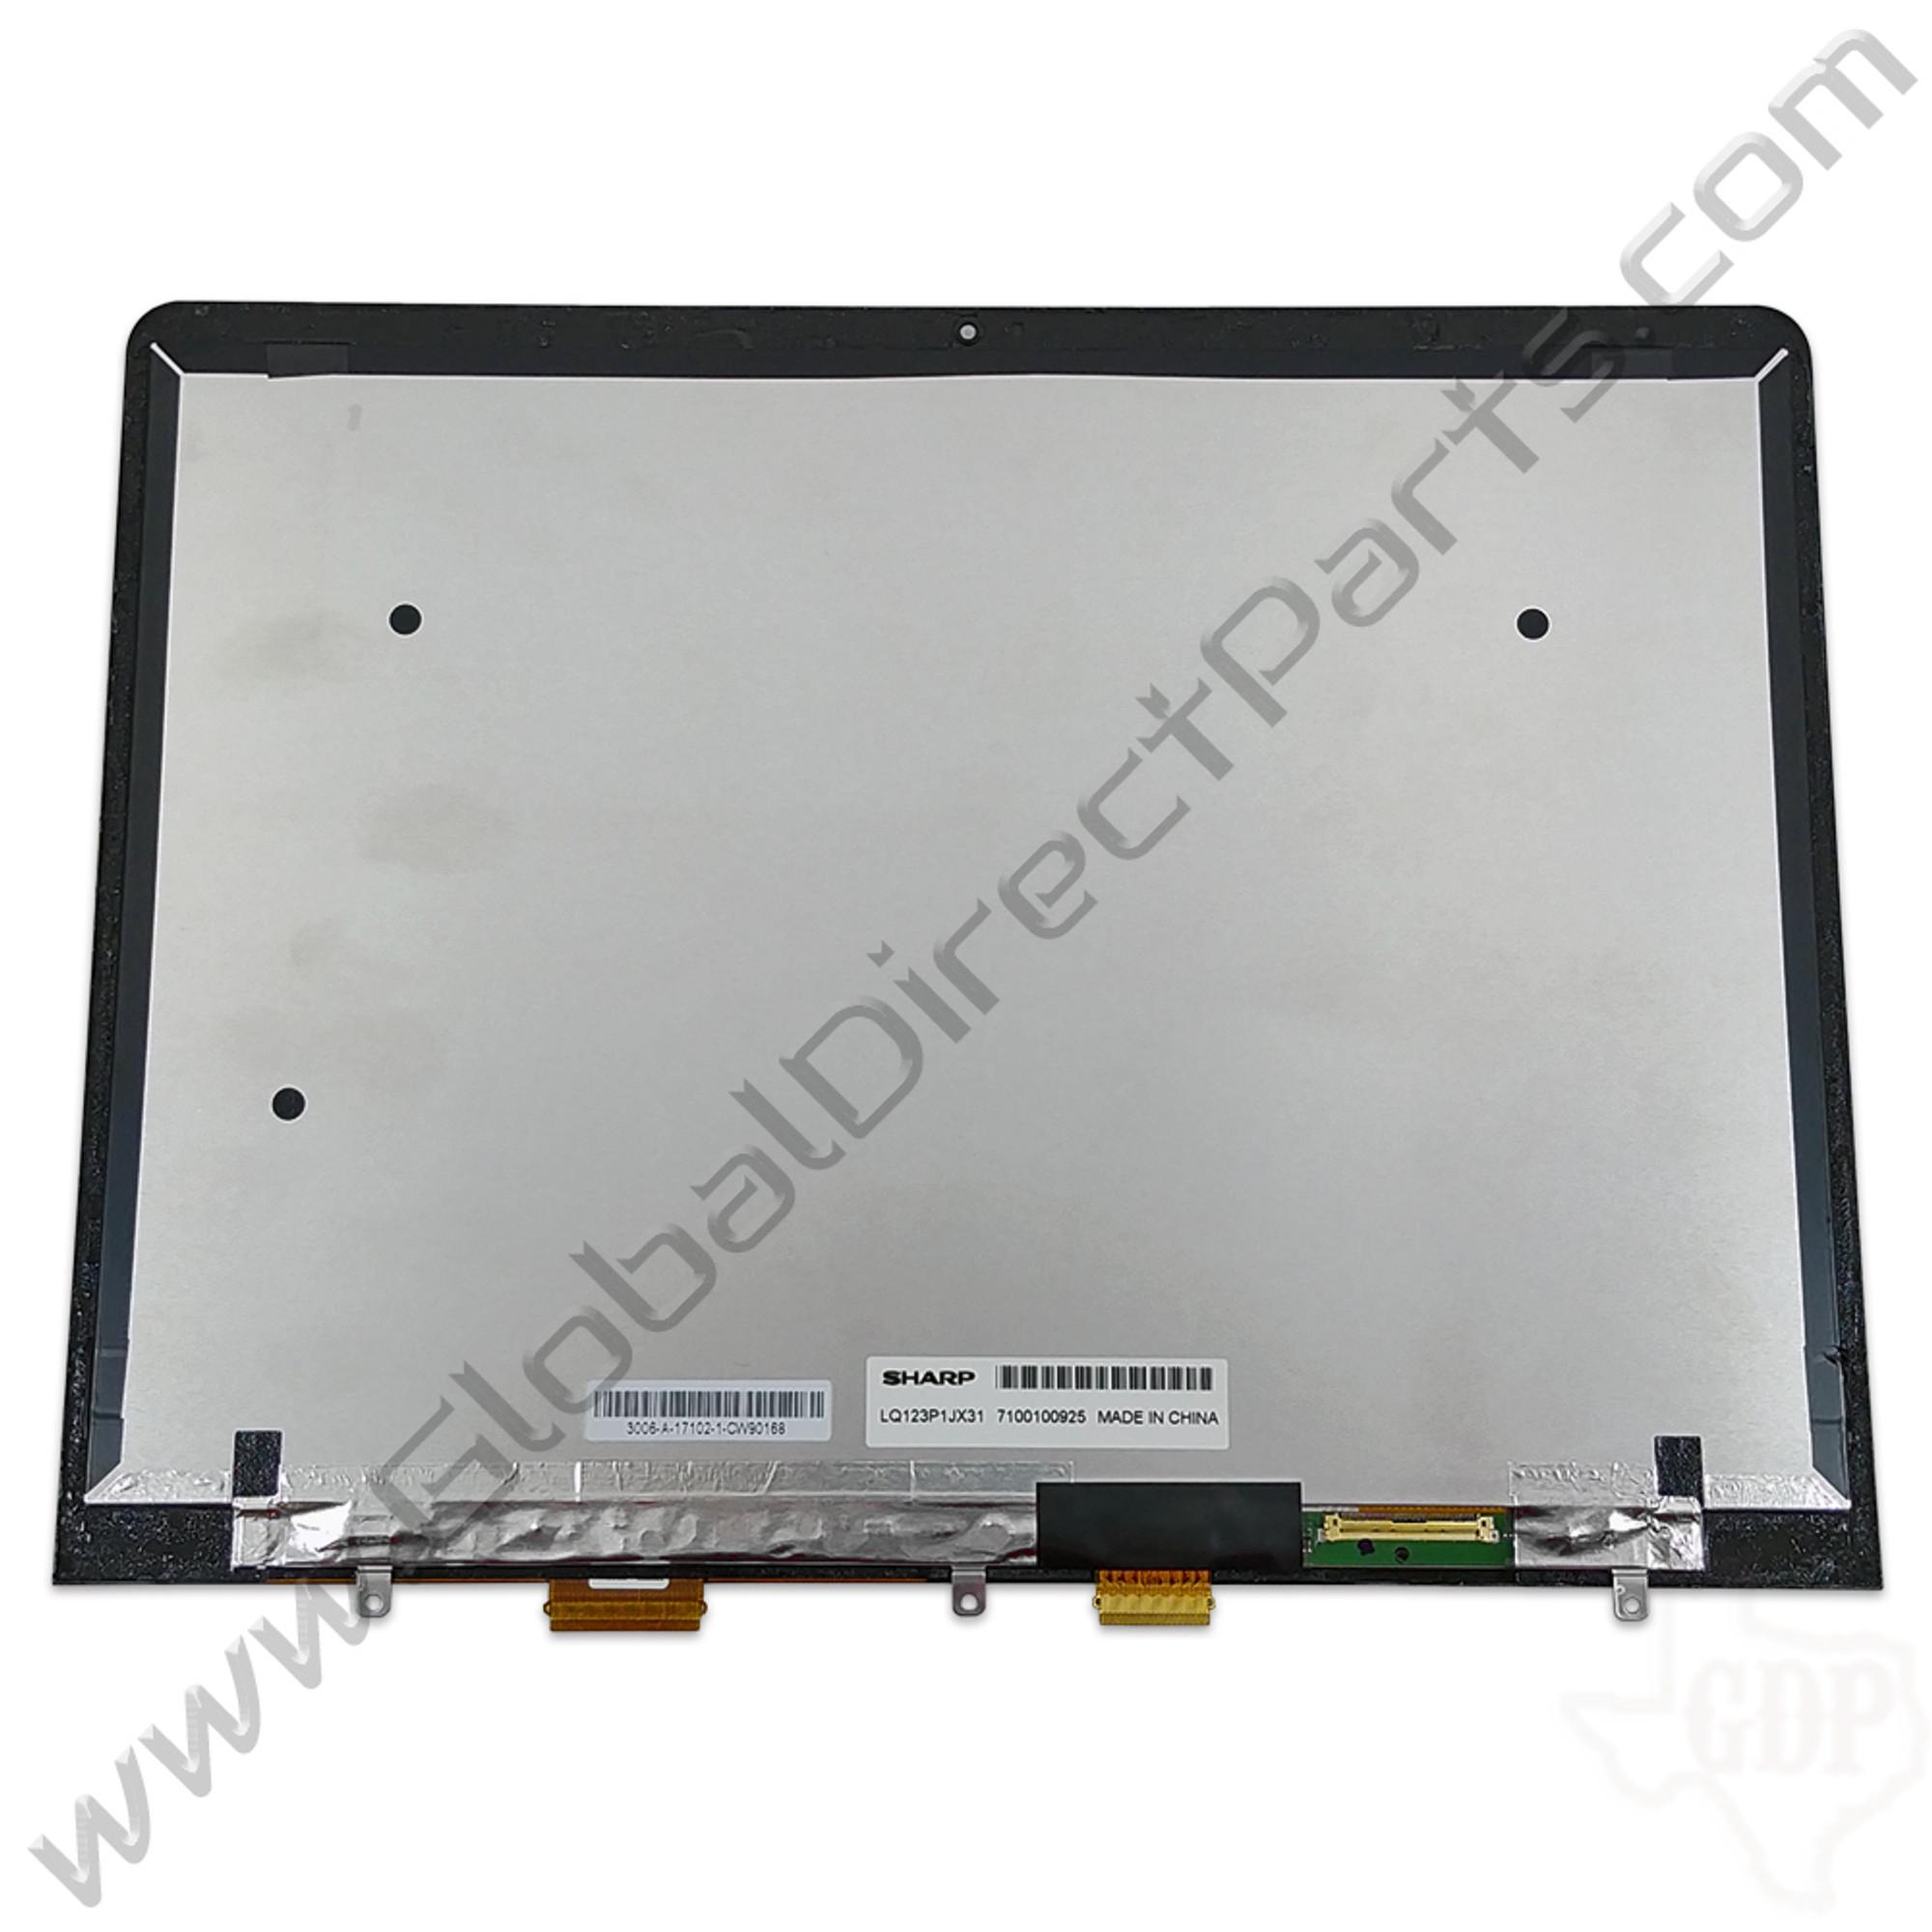 Samsung Chromebook Pro Vs Plus